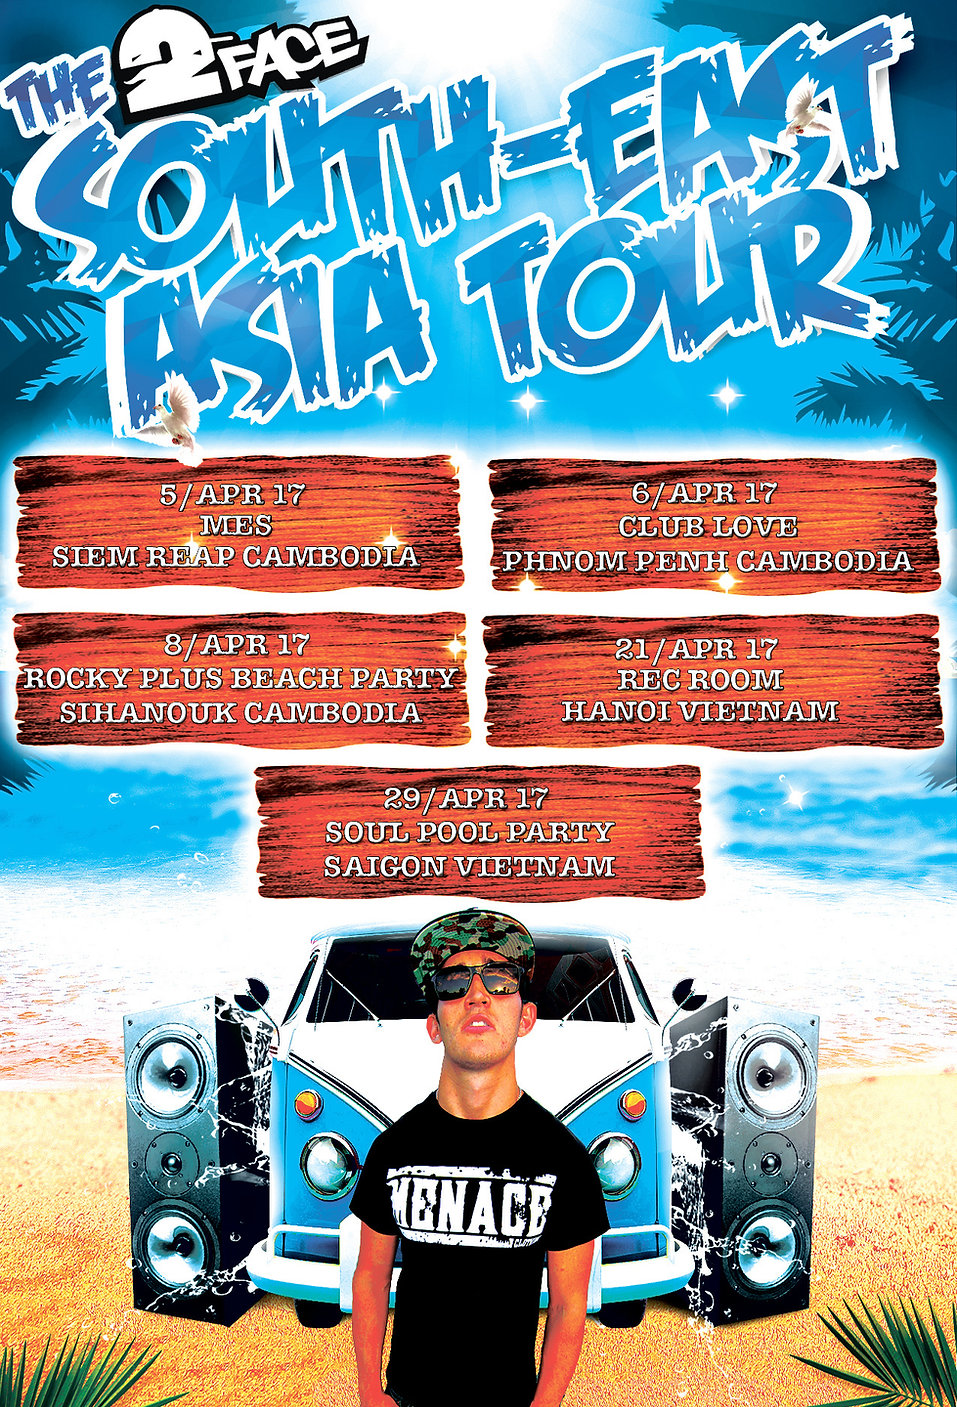 2Face_Southeast_Asia_Tour.jpg